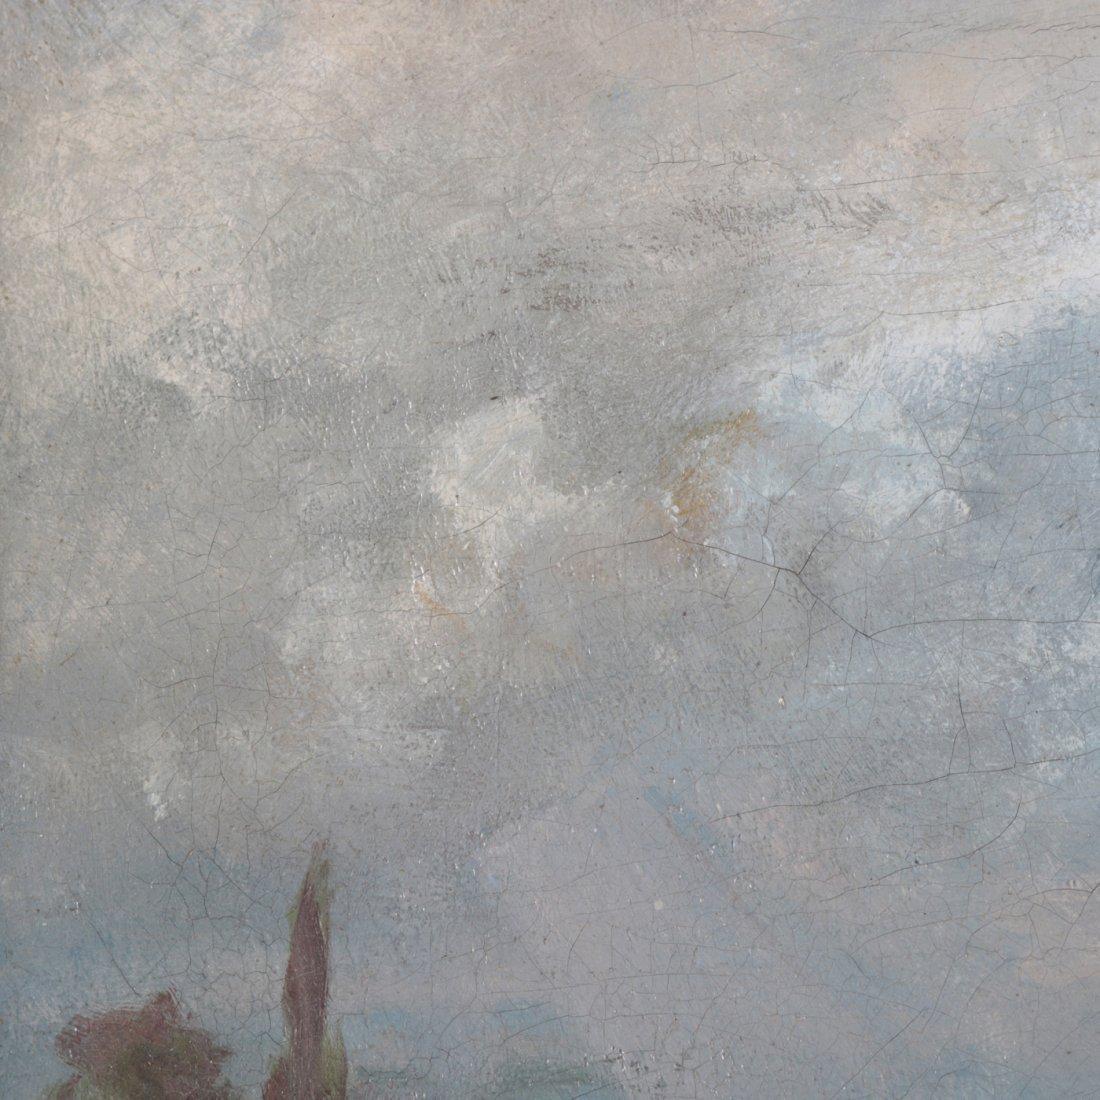 Antique Oil on Canvas Landscape Painting with Farm - 4